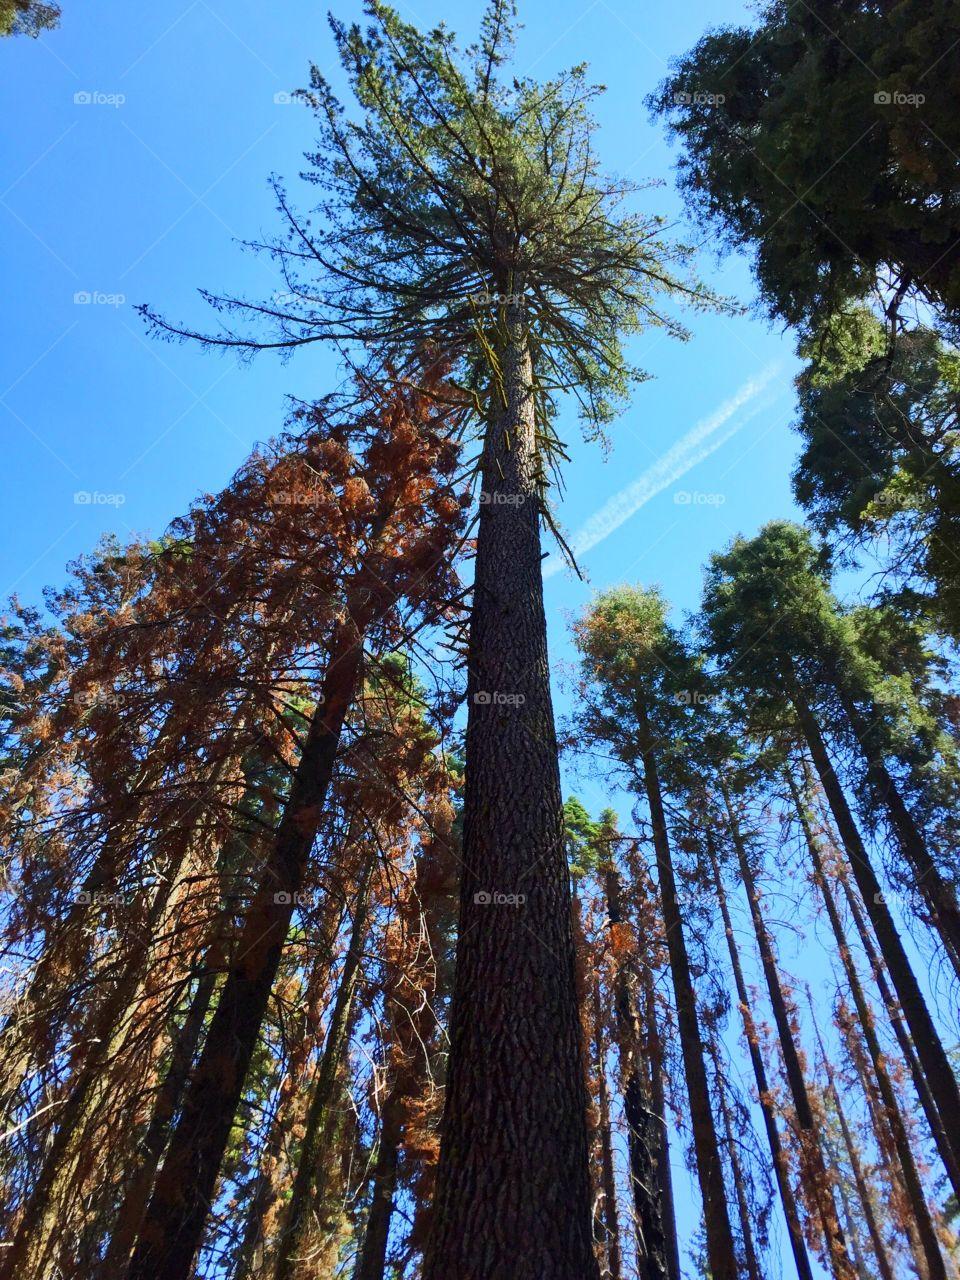 Giant sequoia,Yosemite. Giant sequoia,Yosemite